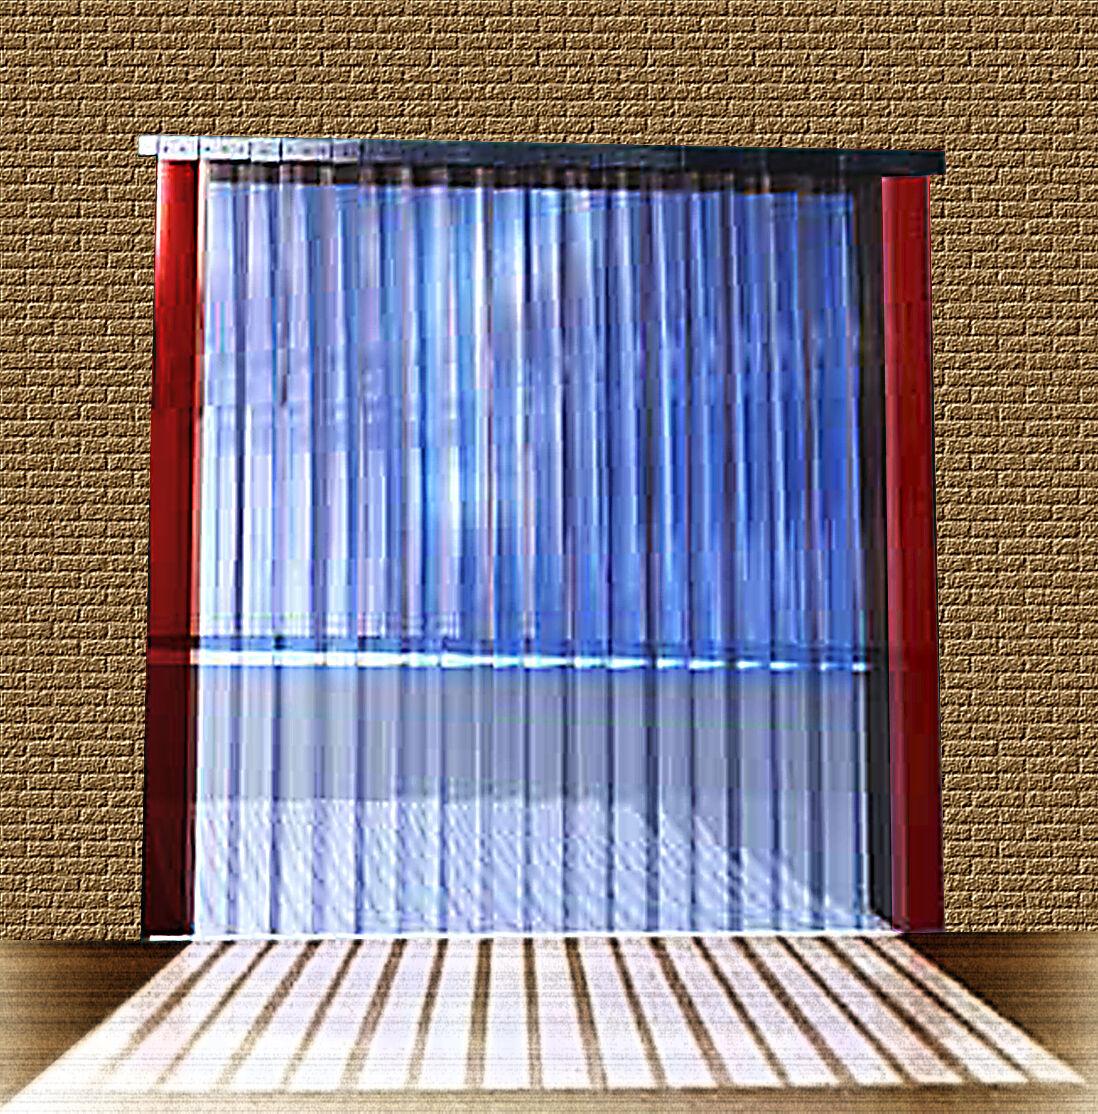 B 2,50m x H2,75m Lamellen PVC Streifen Vorhang 300x3mm